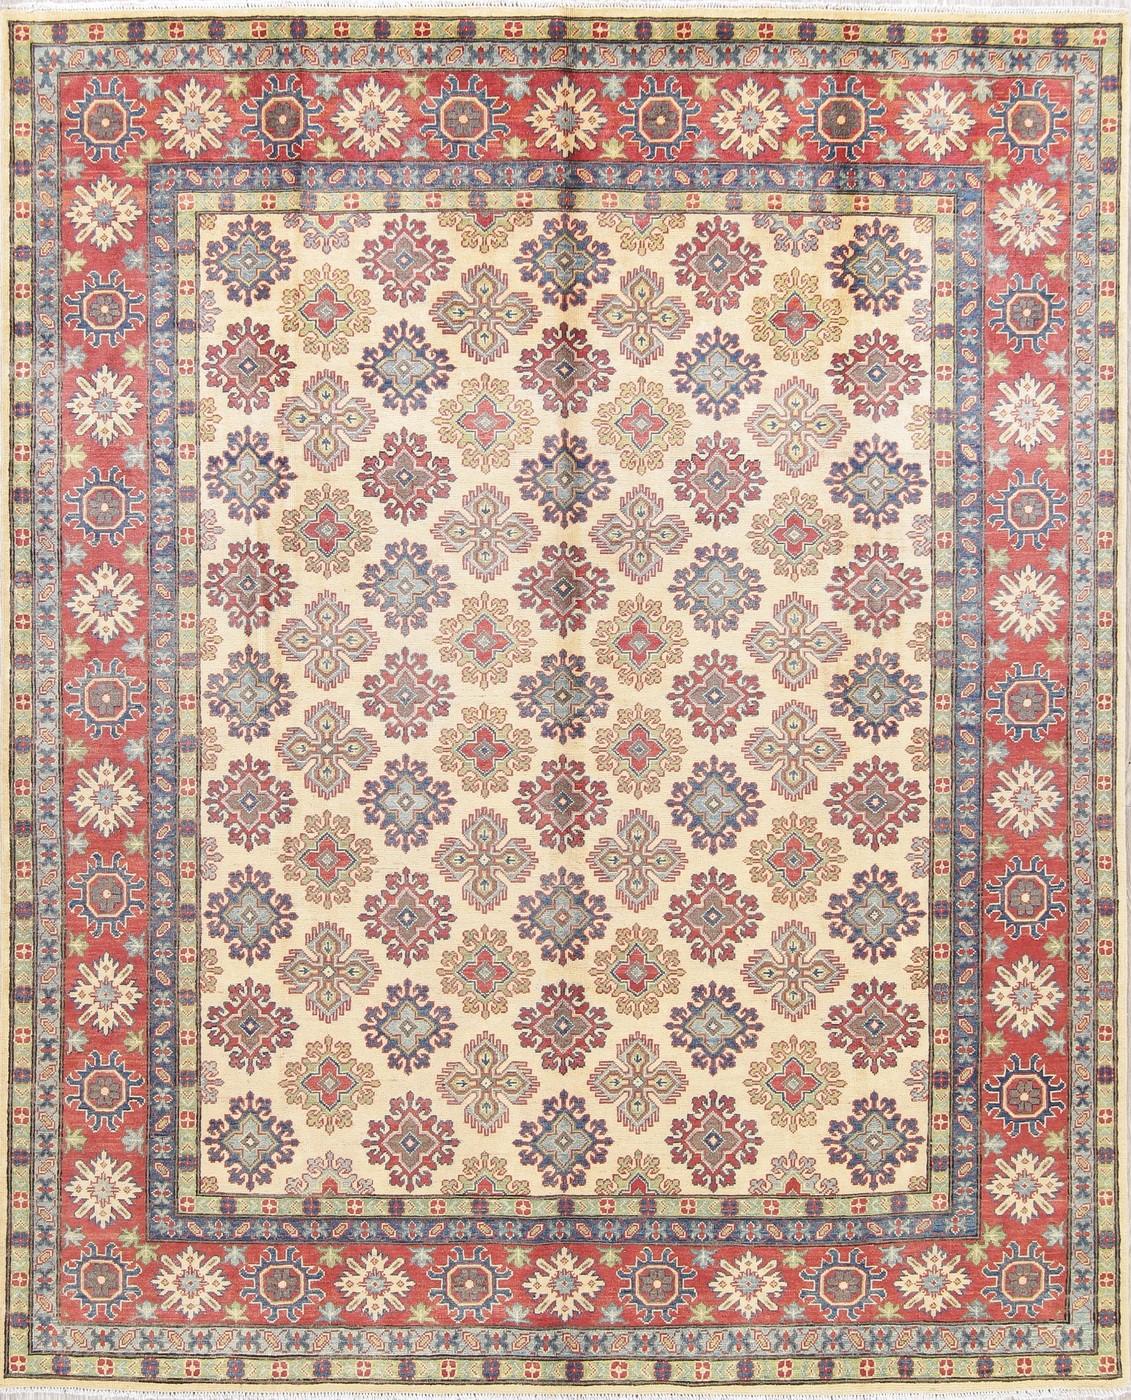 Breathtaking Large Geometric Red 10x12 Bakhtiari Persian: 8'x10' NEW Ivory Kazak Hand-Knotted Geometric Oriental